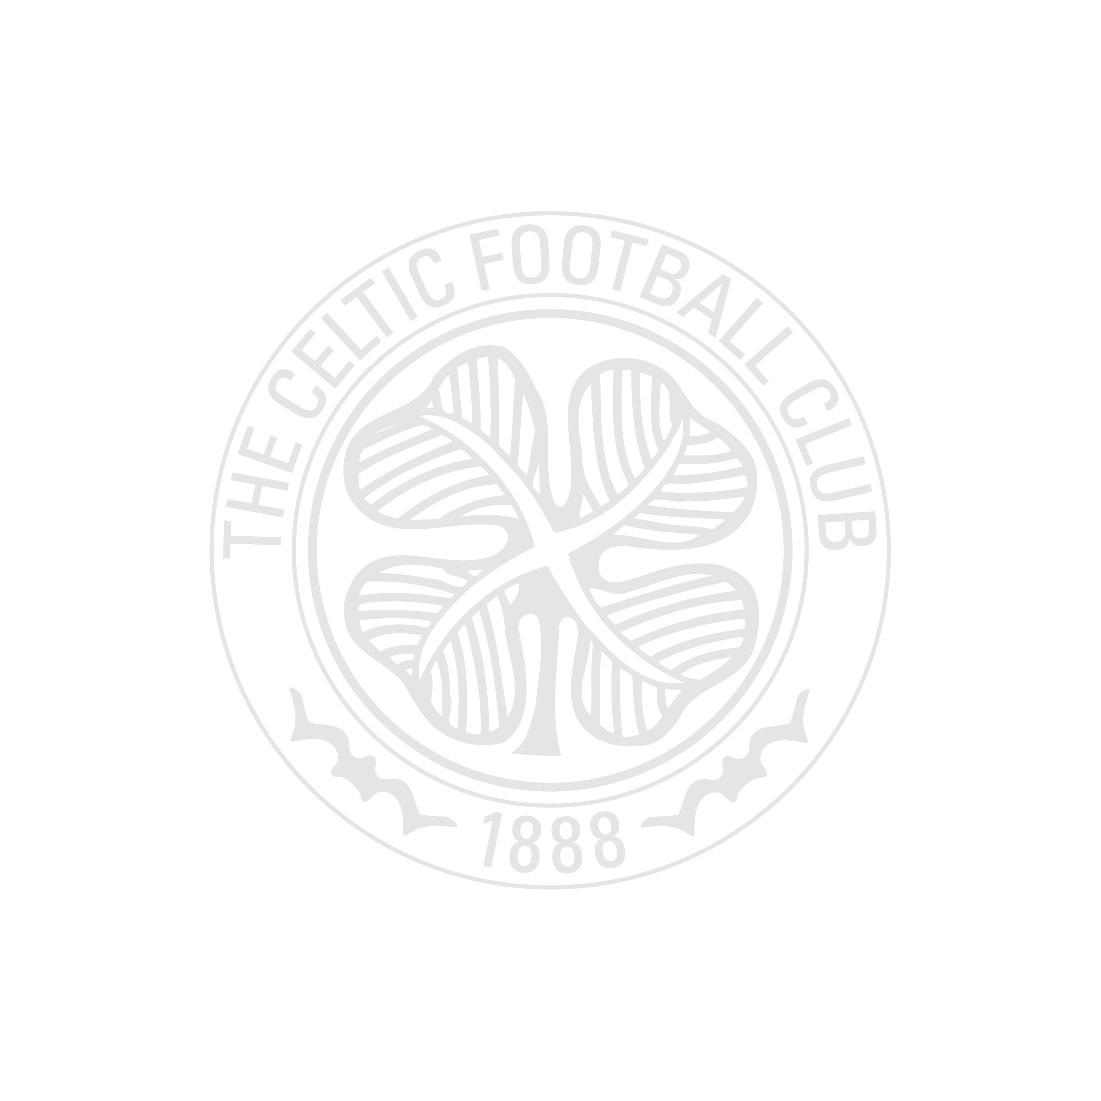 Celtic FC Kiddies Mix